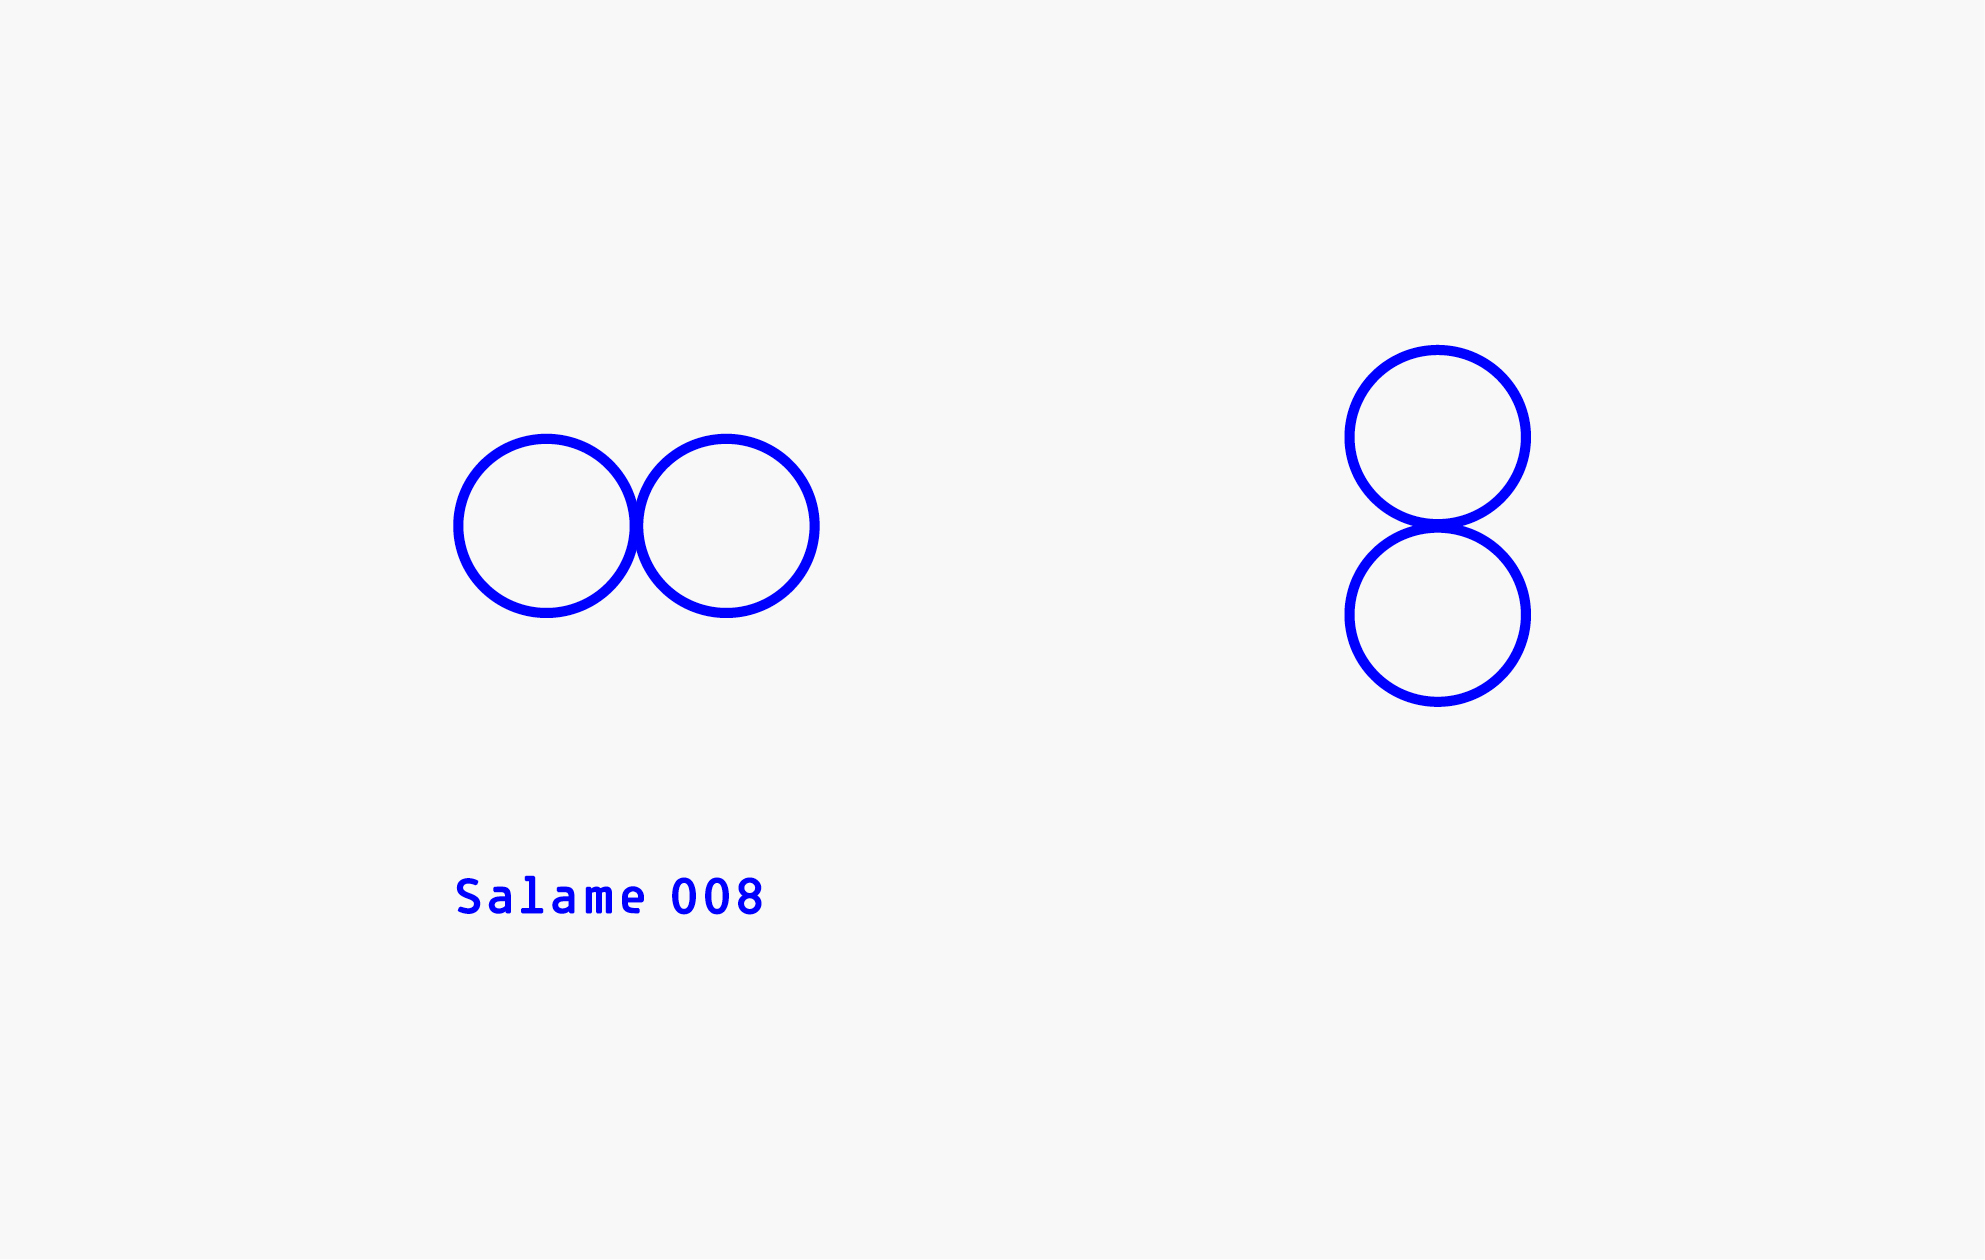 SALAME 008